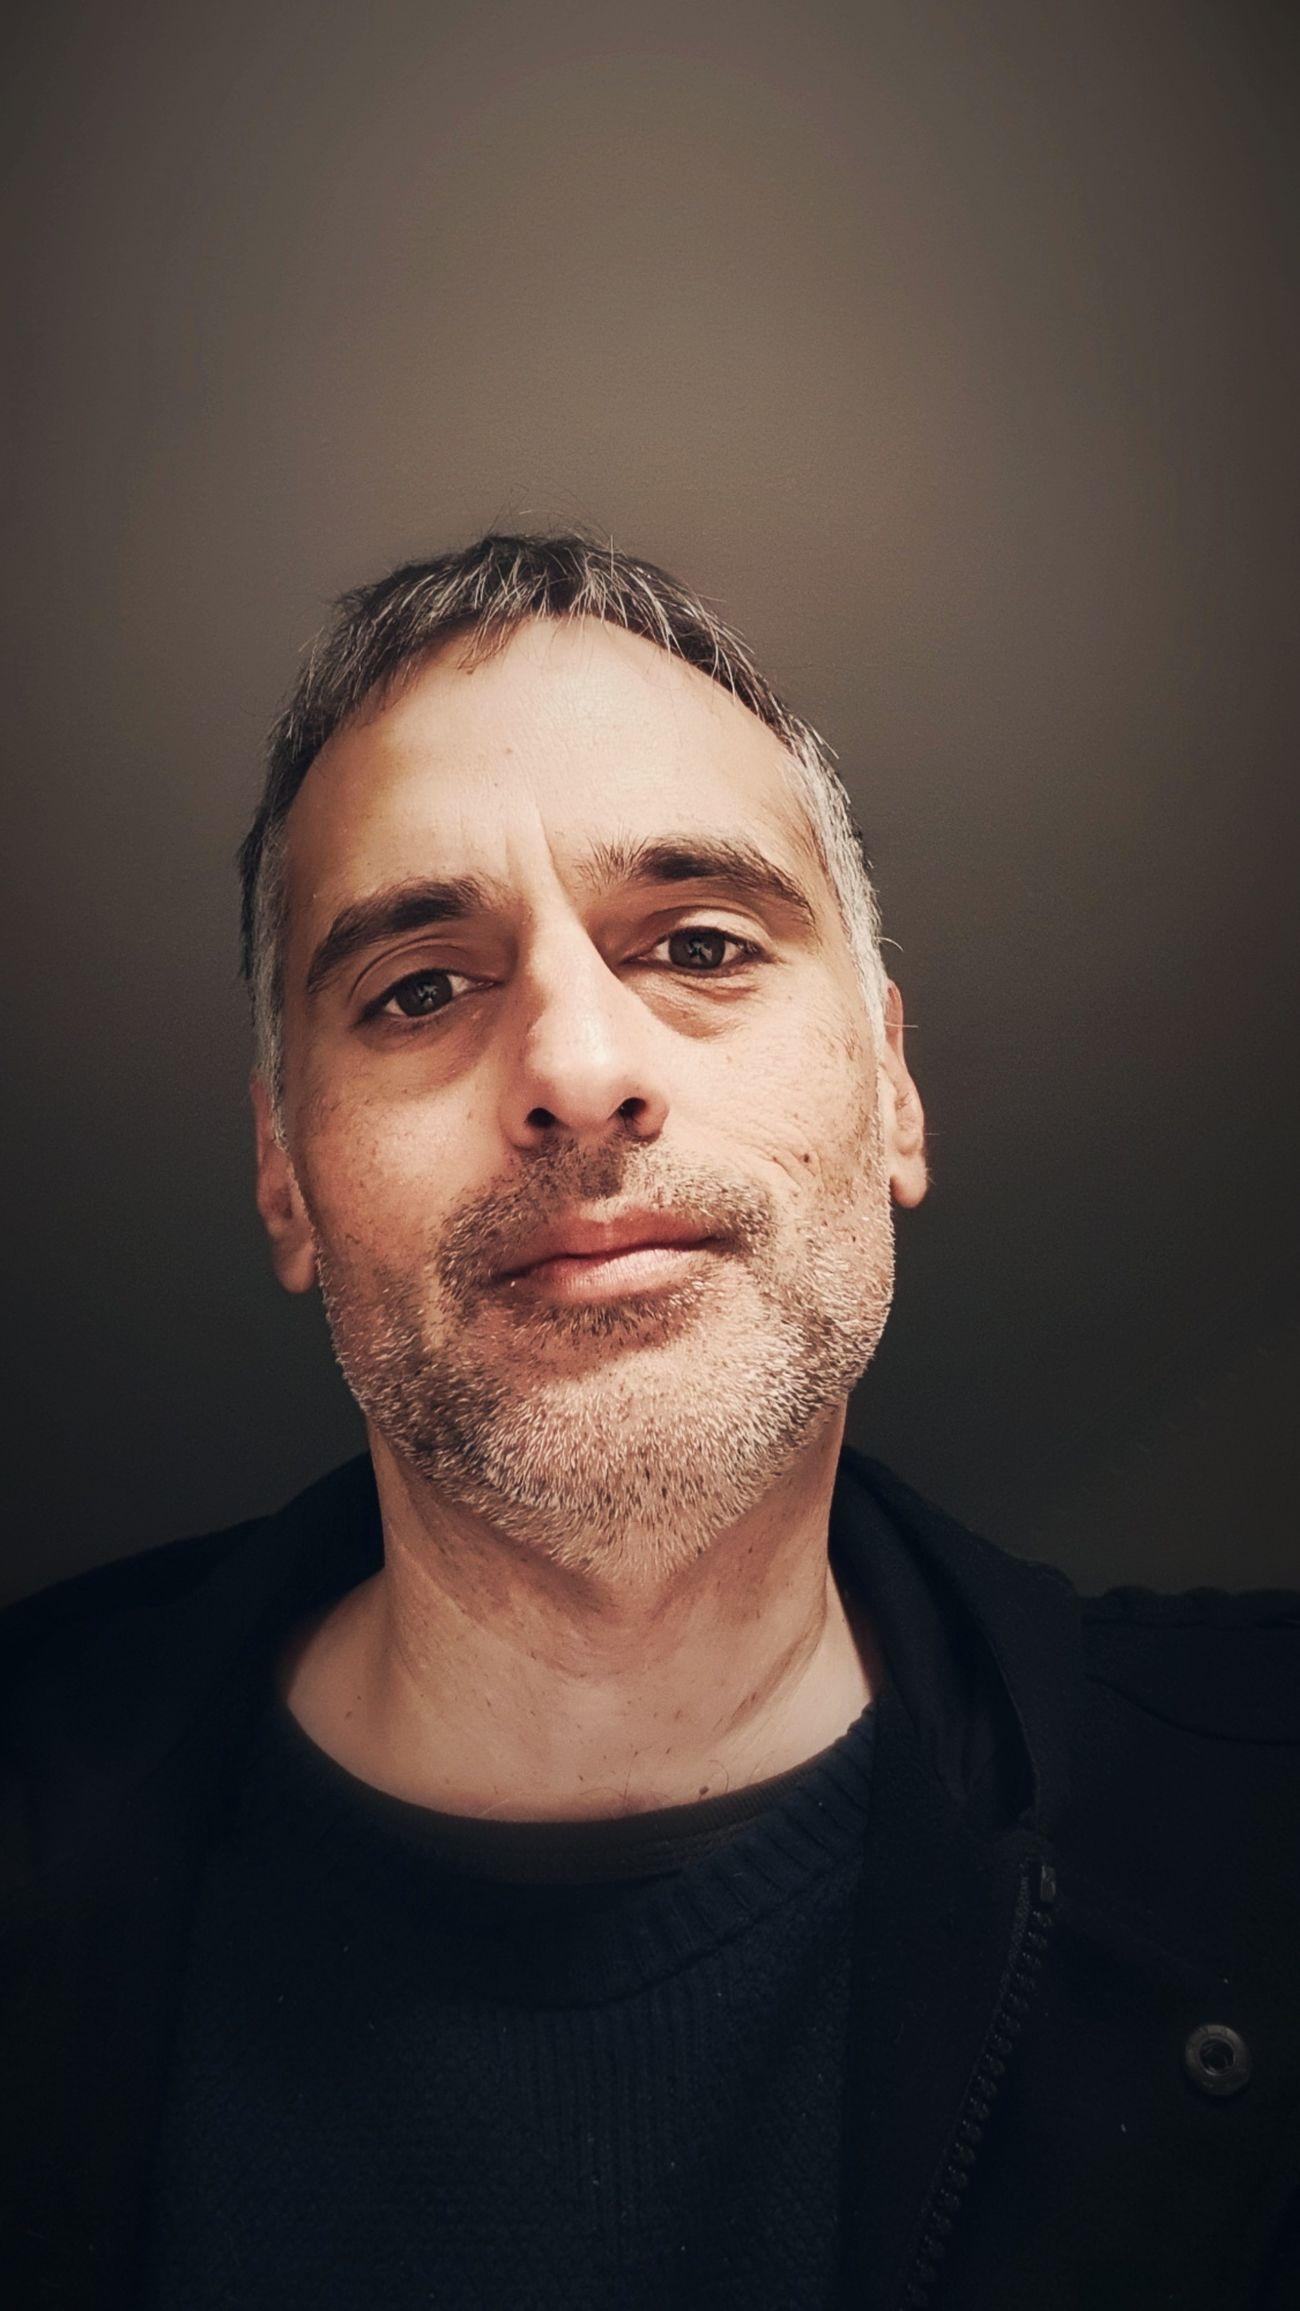 Portrait Headshot One Person Looking At Camera Self Portrait ThatsMe The Portraitist - 2017 EyeEm Awards